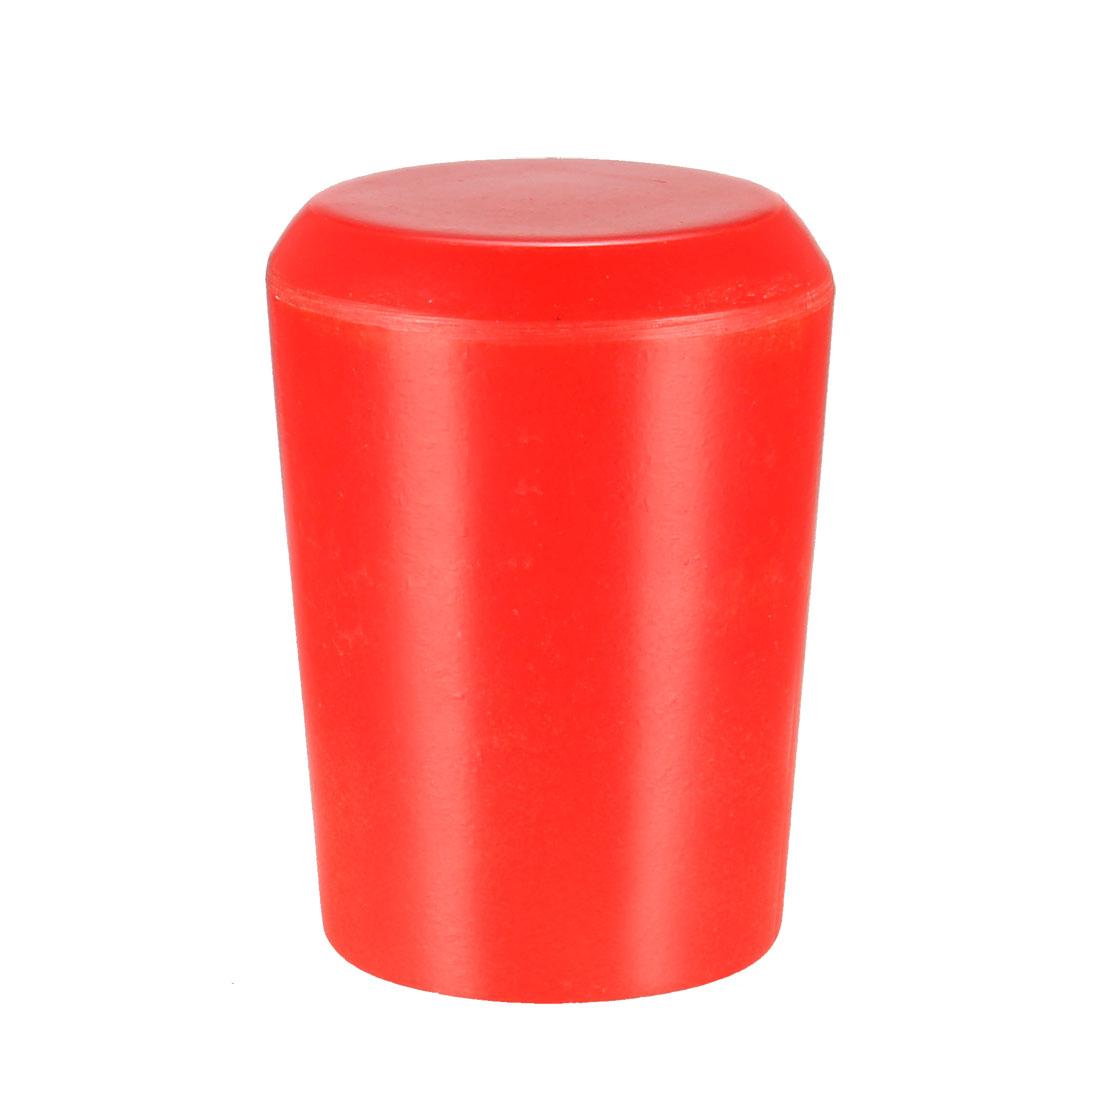 Handwheel M10 Female Thread Hand Grip Handle Plastic 32mm Length